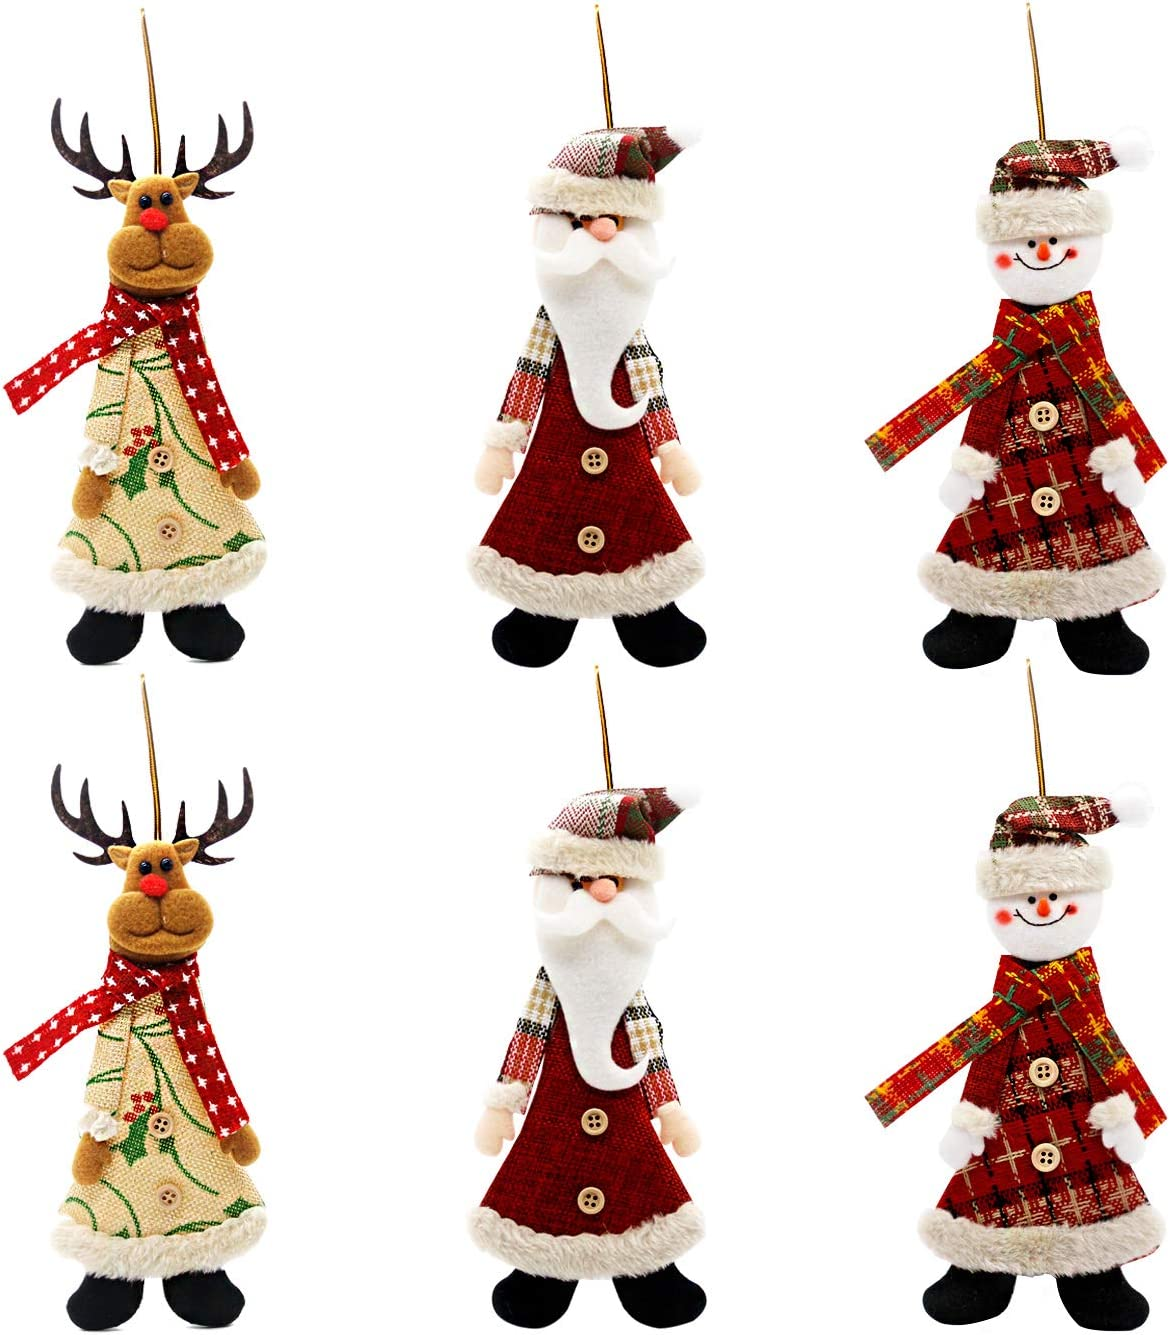 Kyatti 6ct Plush Holiday Characters Christmas Tree Ornaments Set Xmas Hanging Decorations Santa Reindeer Snowman for Holiday Party Decor